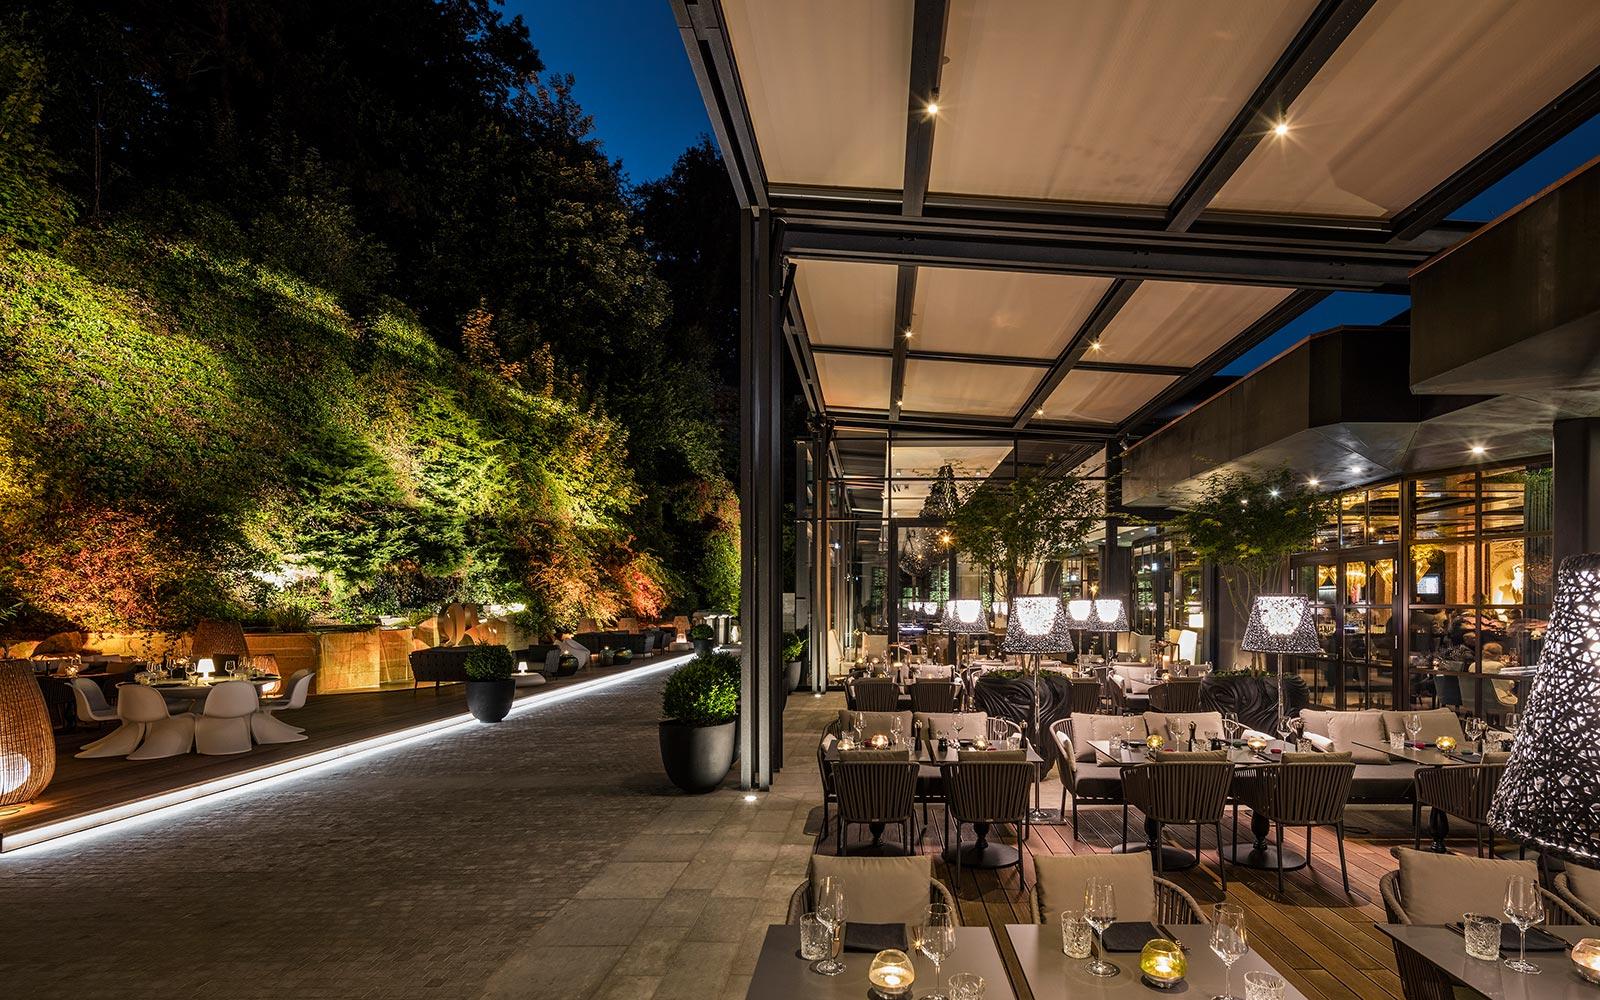 The Grill Baden-Baden